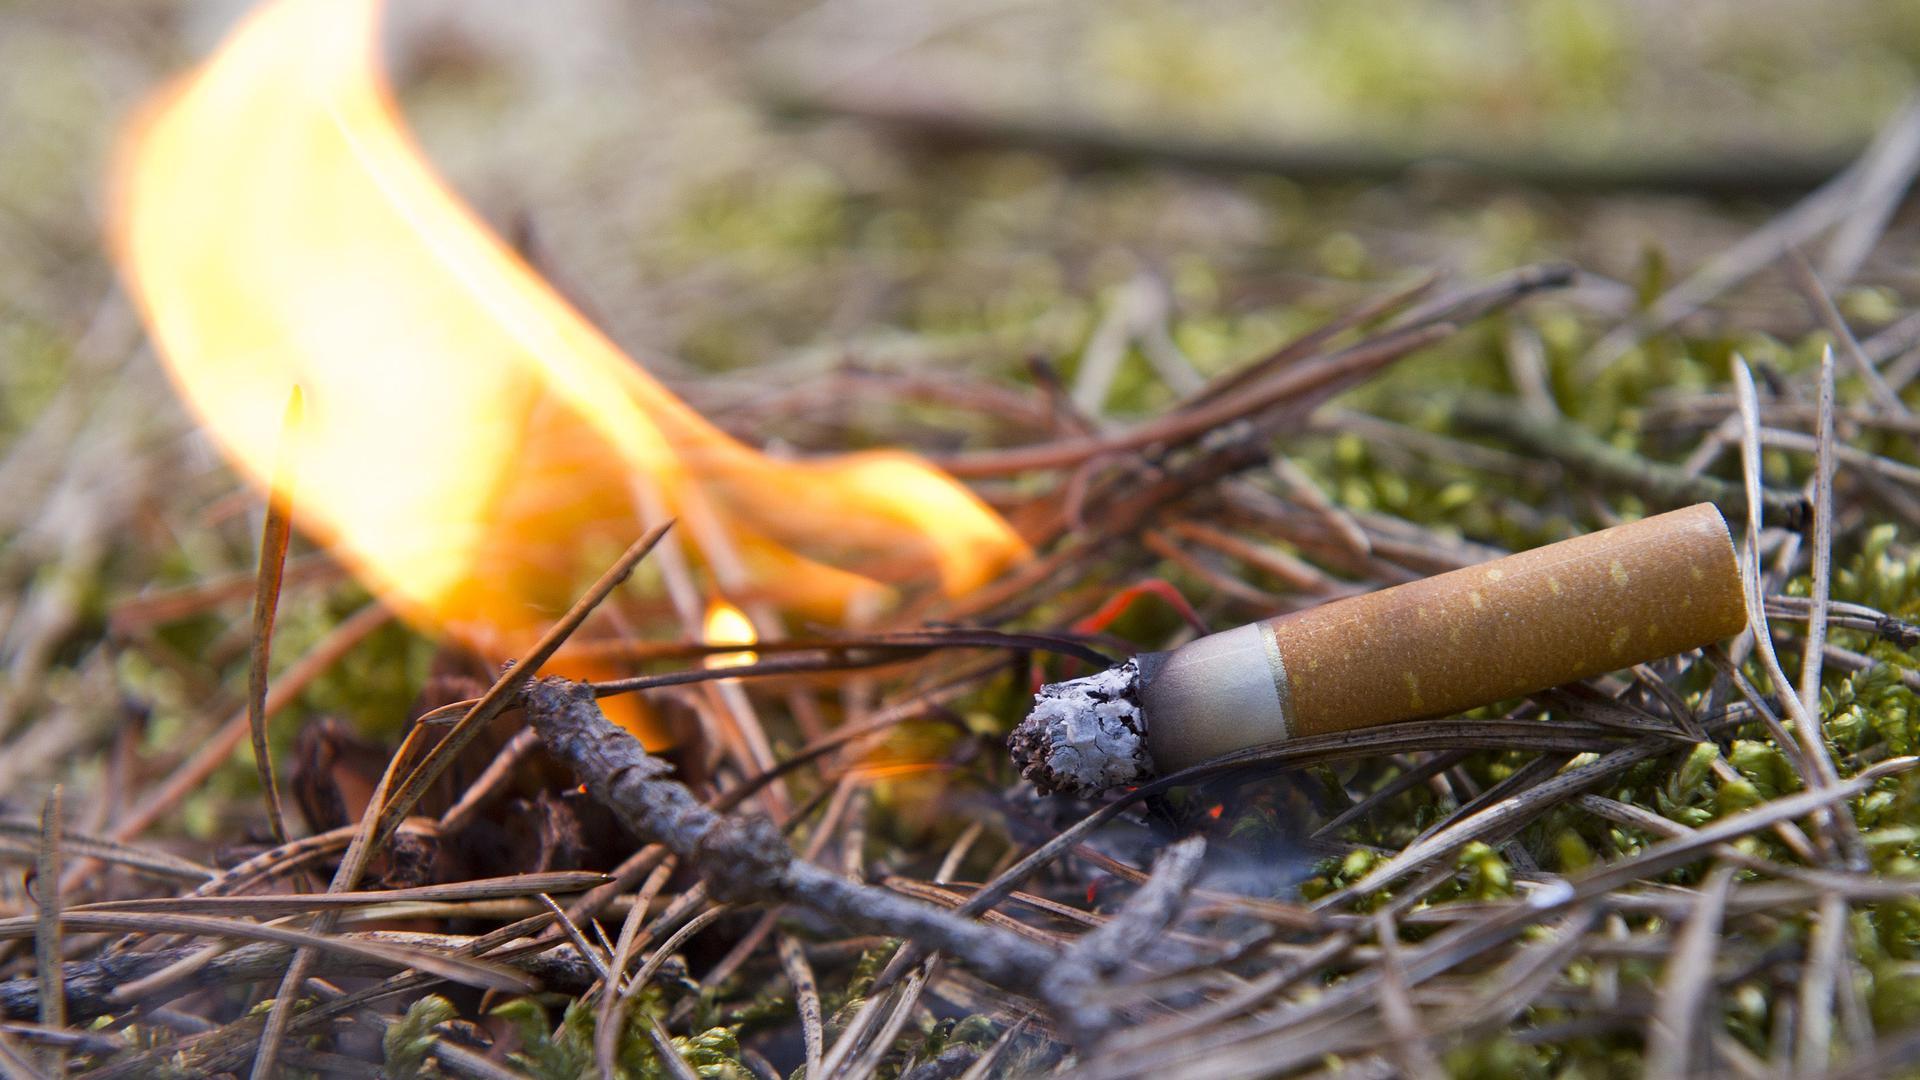 Eine achtlos weggeworfene Zigarettenkippe.